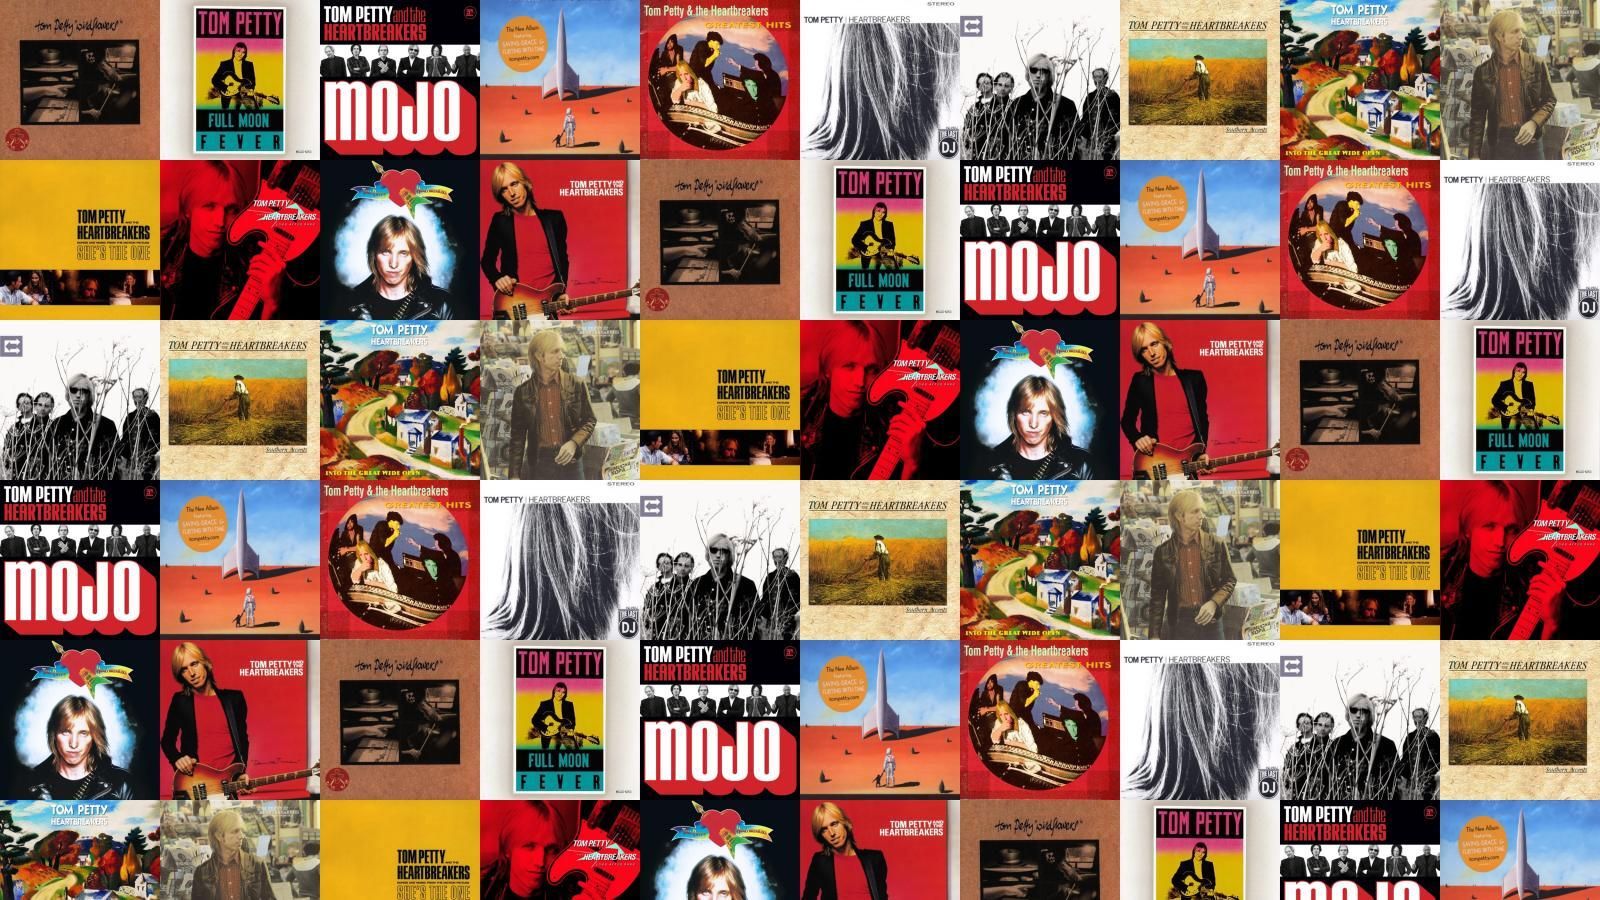 Tom Petty Wildflowers Tom Petty Full Moon Wallpaper Tiled Desktop 1600x900